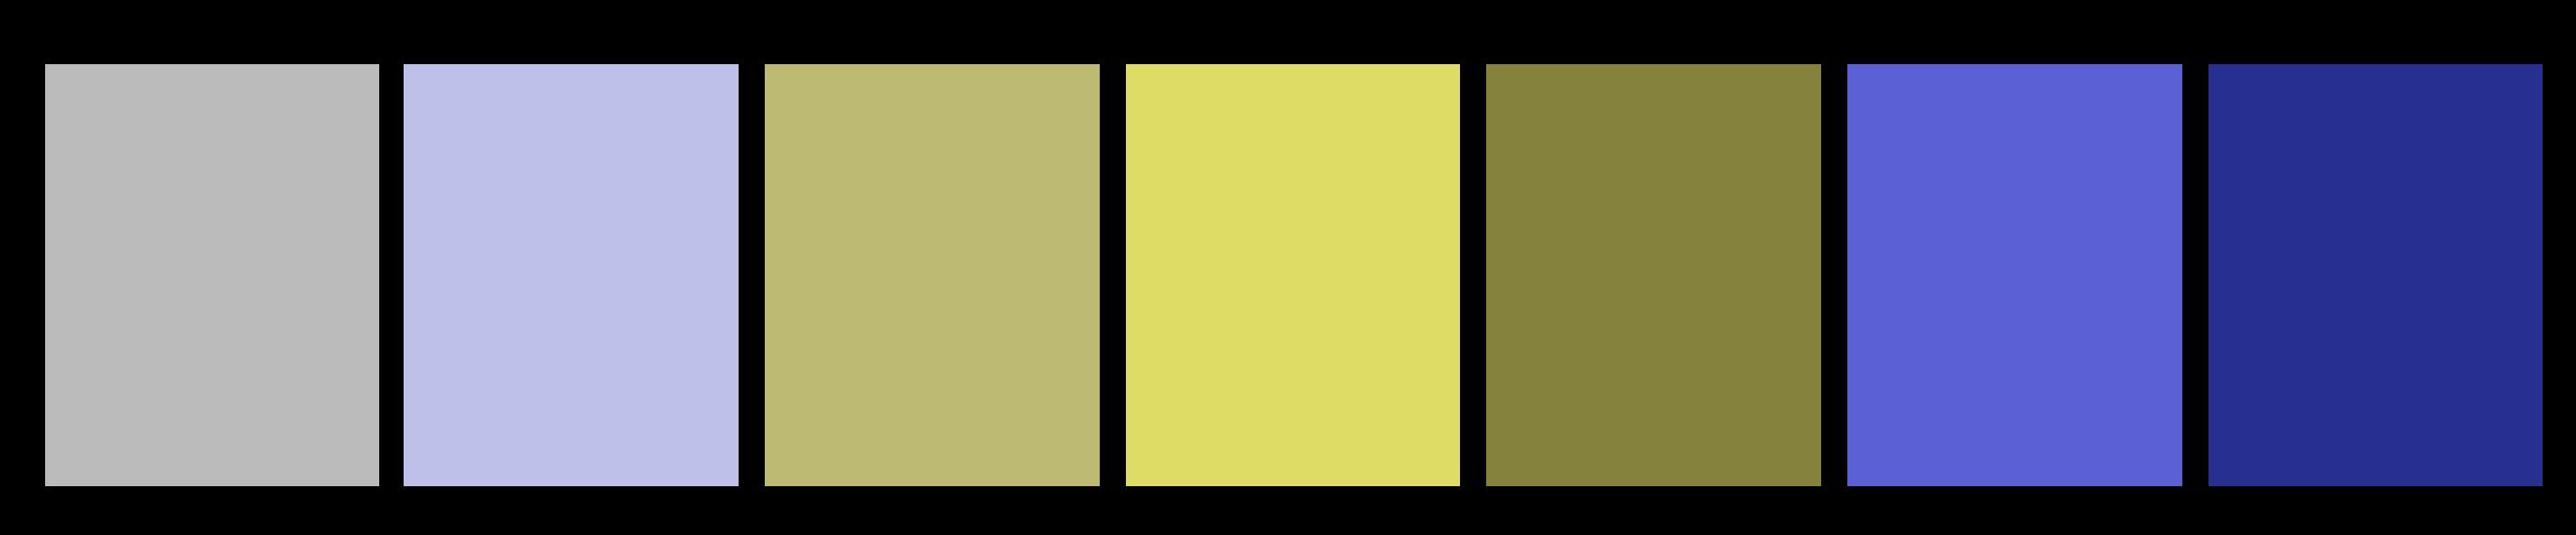 Color blind protanopia